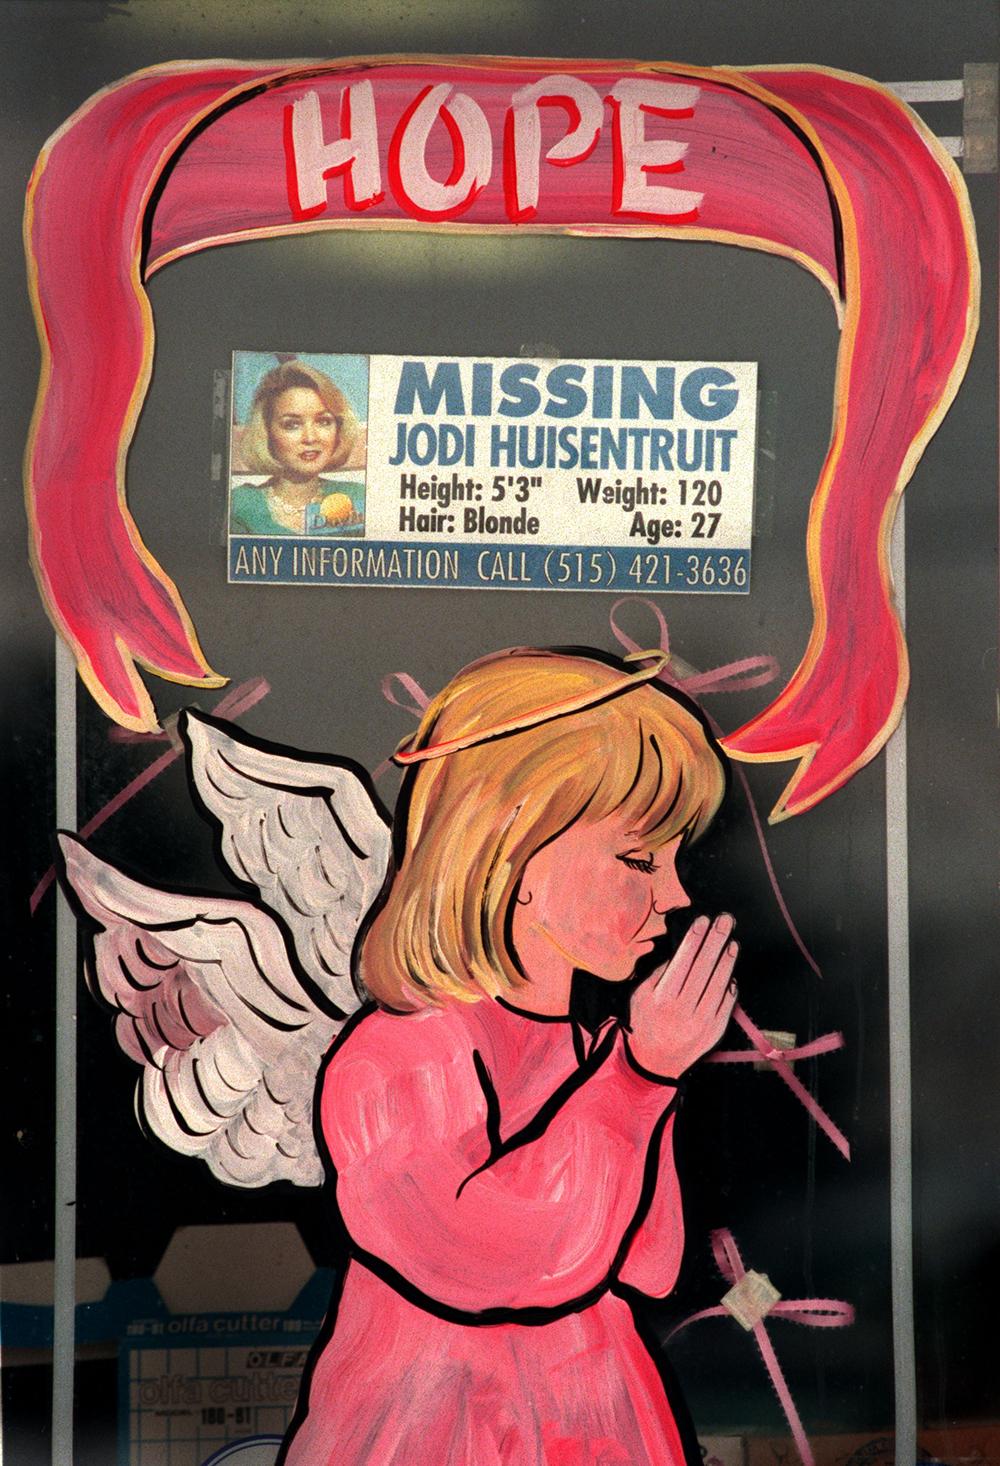 Missing Iowa TV journalist Jodi Huisentruit's family still searching years later, doc reveals: 'It's horrible'